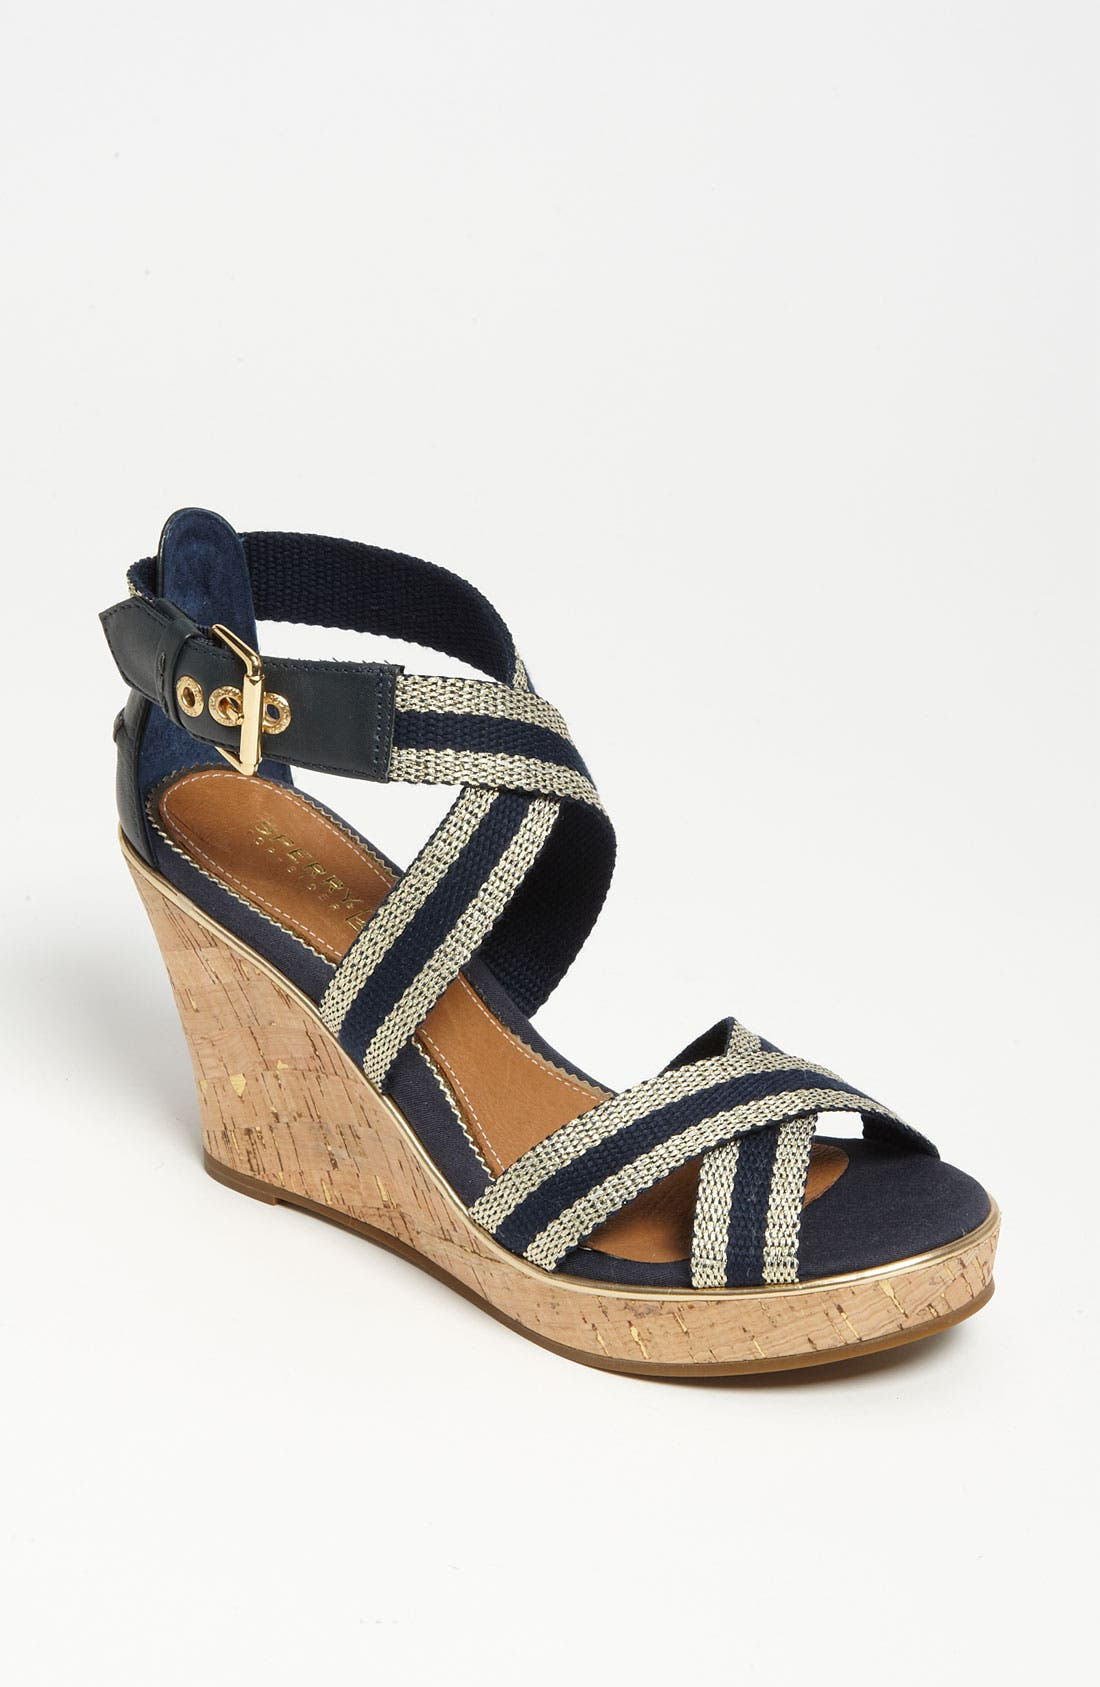 Alternate Image 1 Selected - Sperry Top-Sider® 'Harbordale' Sandal